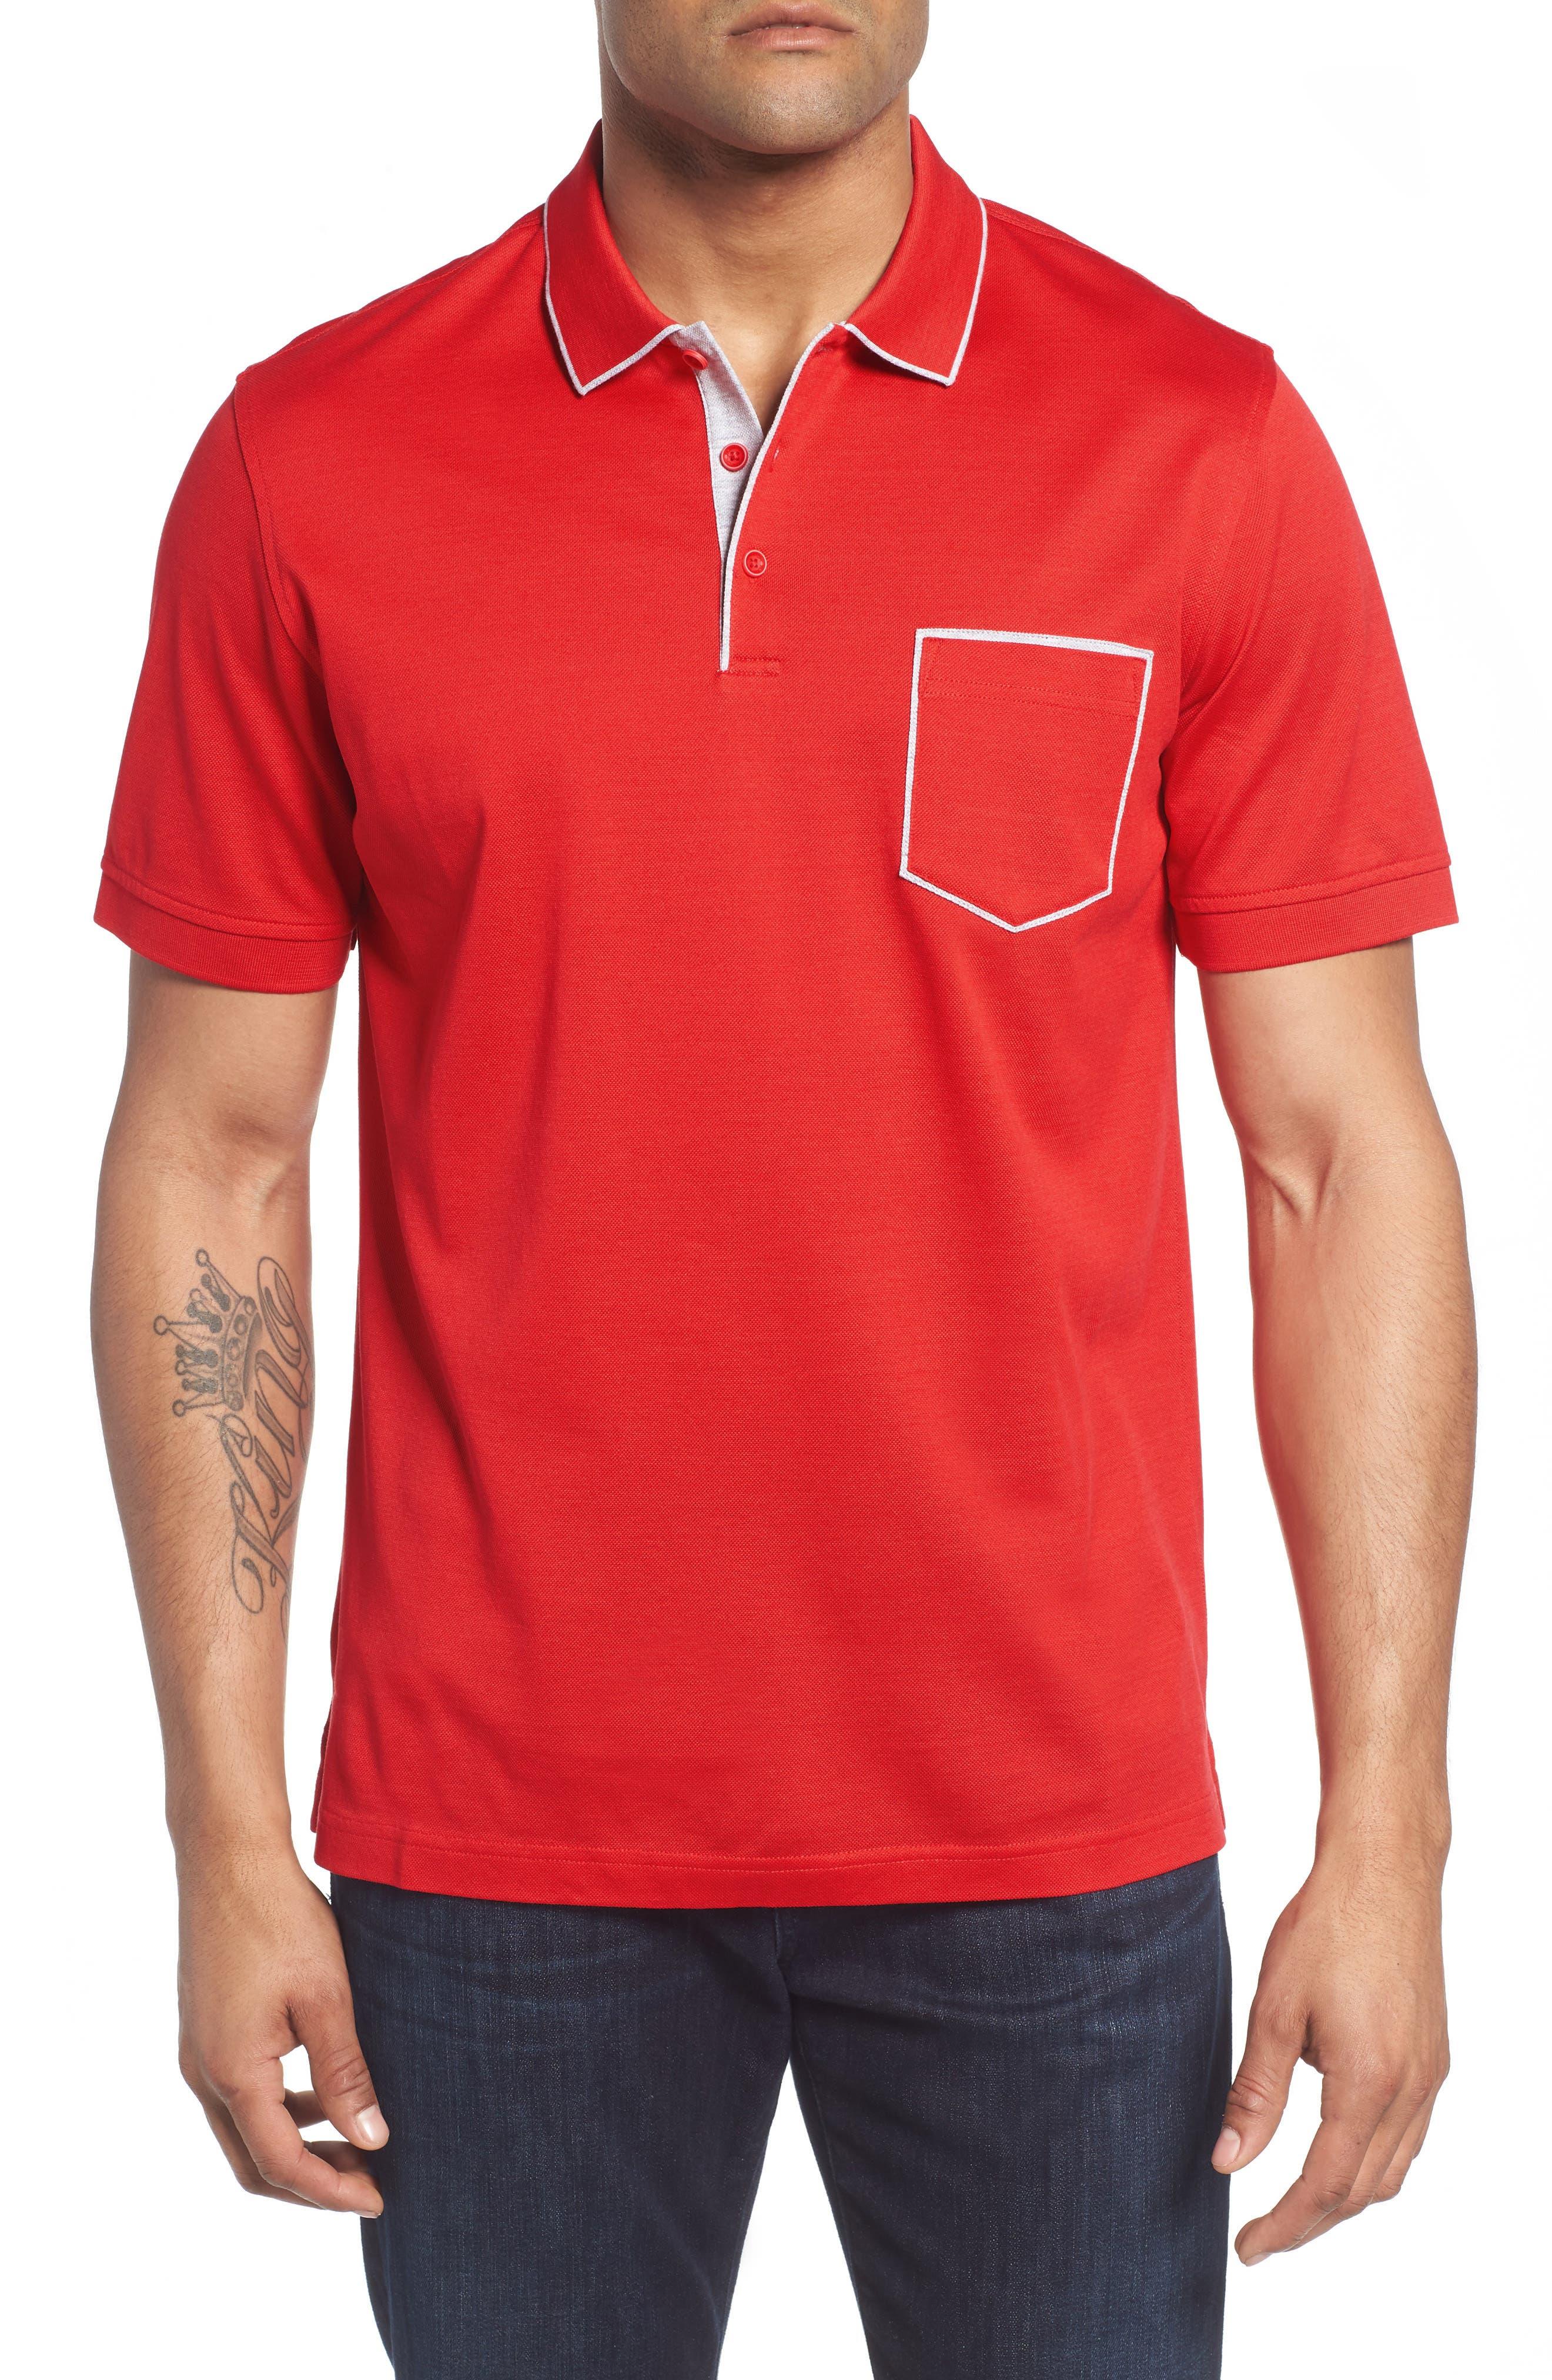 Piqué Knit Polo,                         Main,                         color, Red